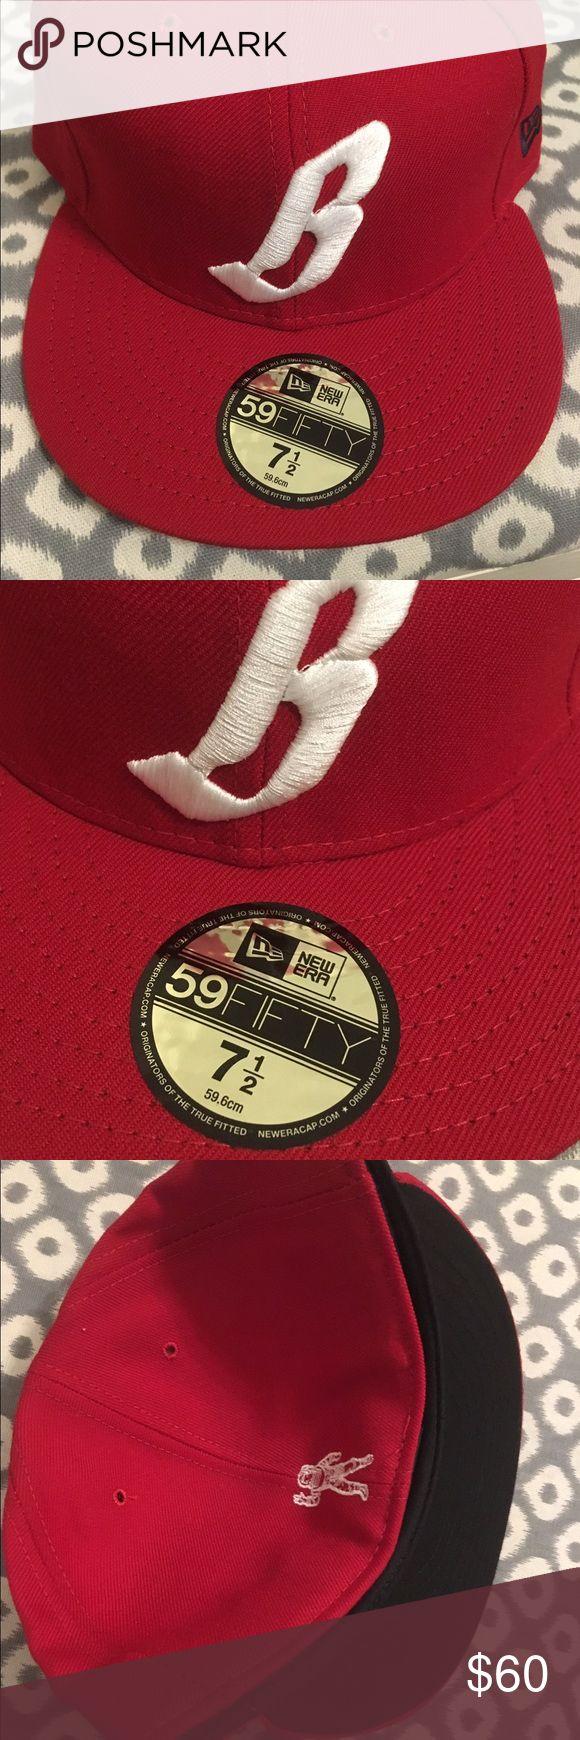 New Era 5950 Billionaire Boys Club 7 1/2 hat cap New Era 5950 59FIFTY BBC Billionaire Boys Club fitted. New with sticker. Size 7 1/2. Billionaire Boys Club Accessories Hats